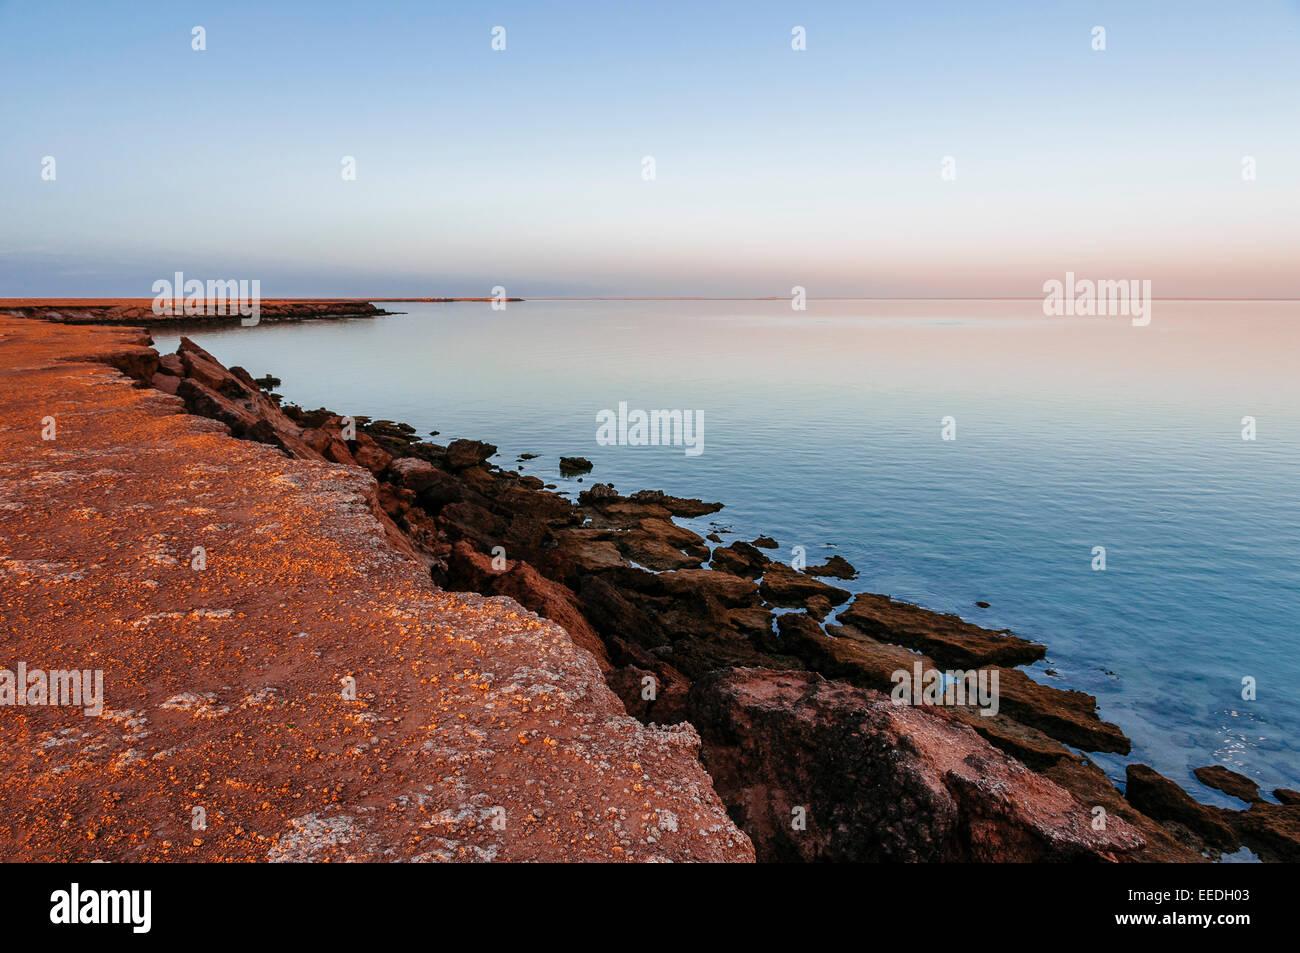 Cliffs, Dakhla, Western Sahara, Morocco. Stock Photo